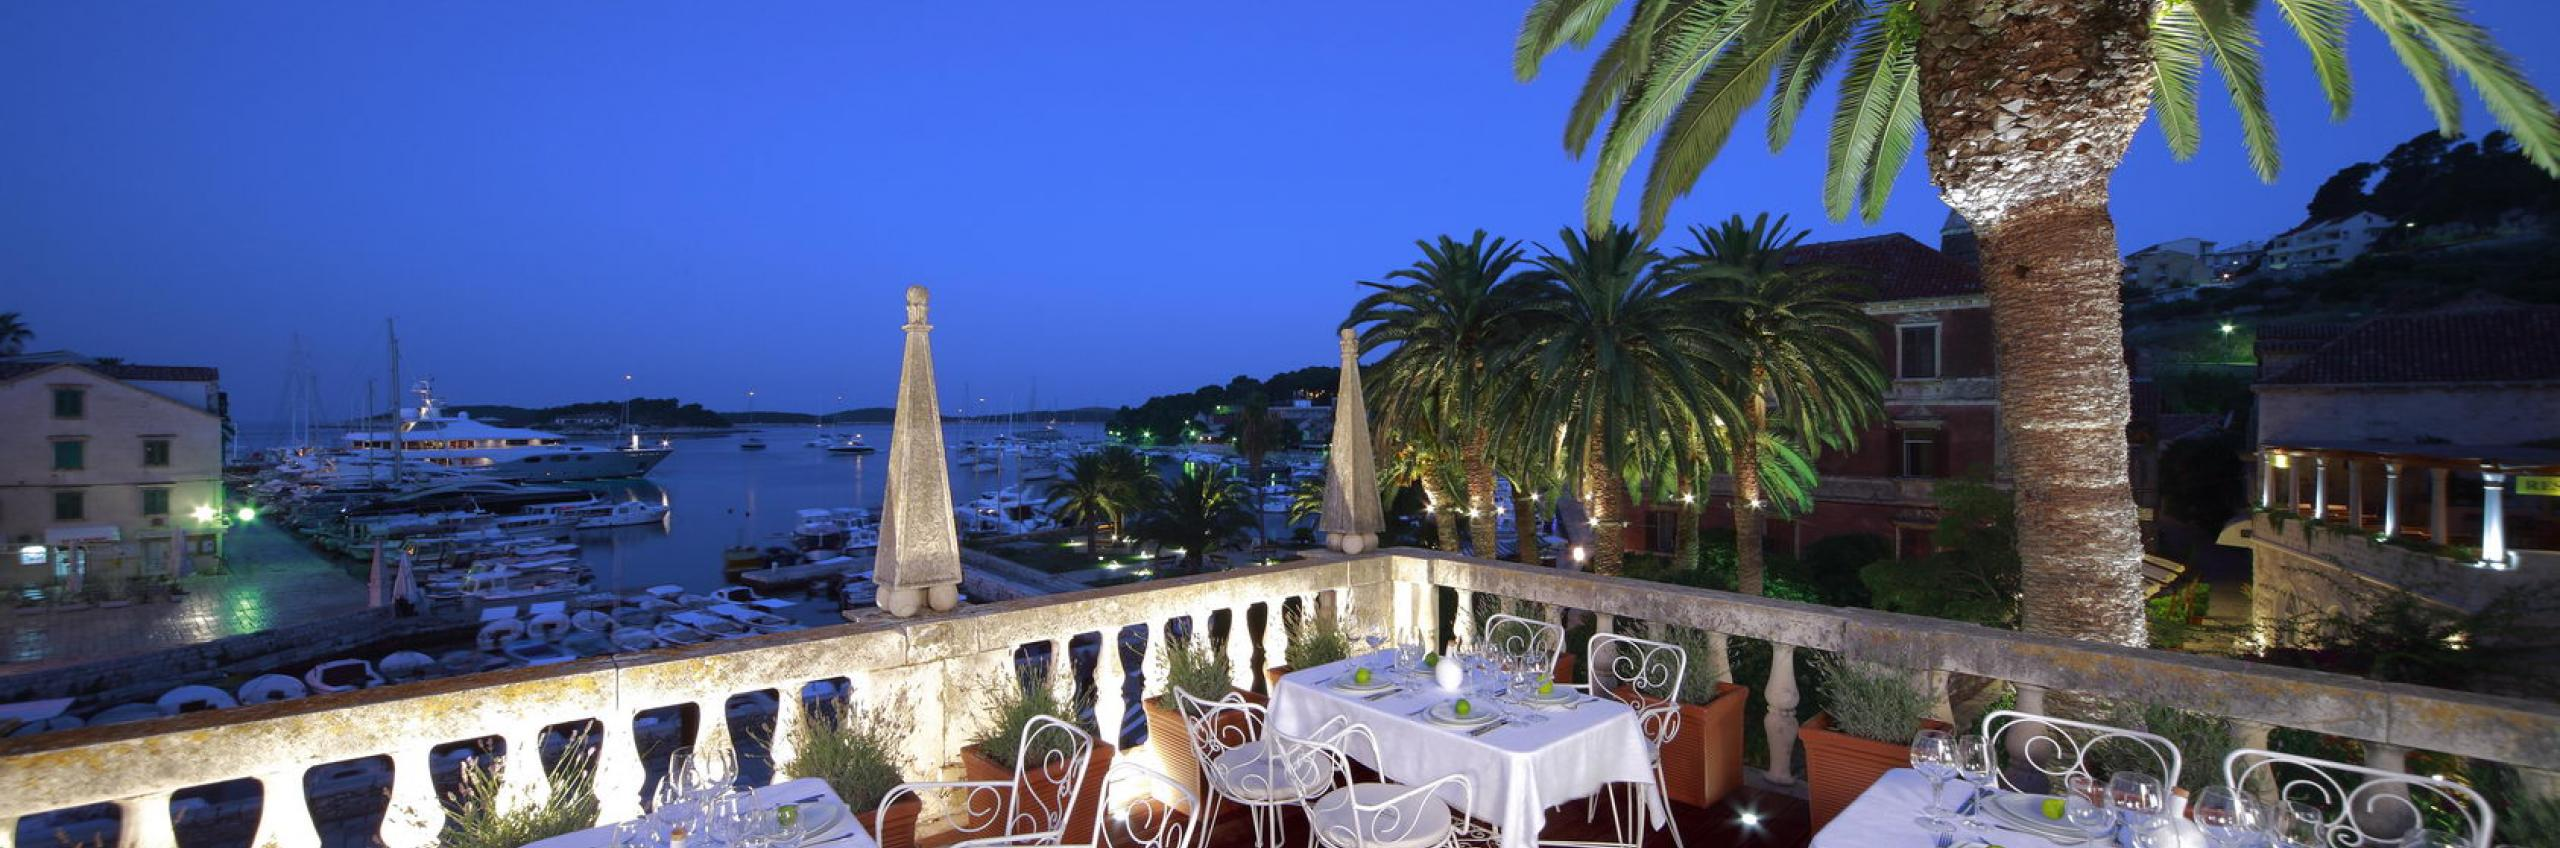 San Marco Venetian terrace